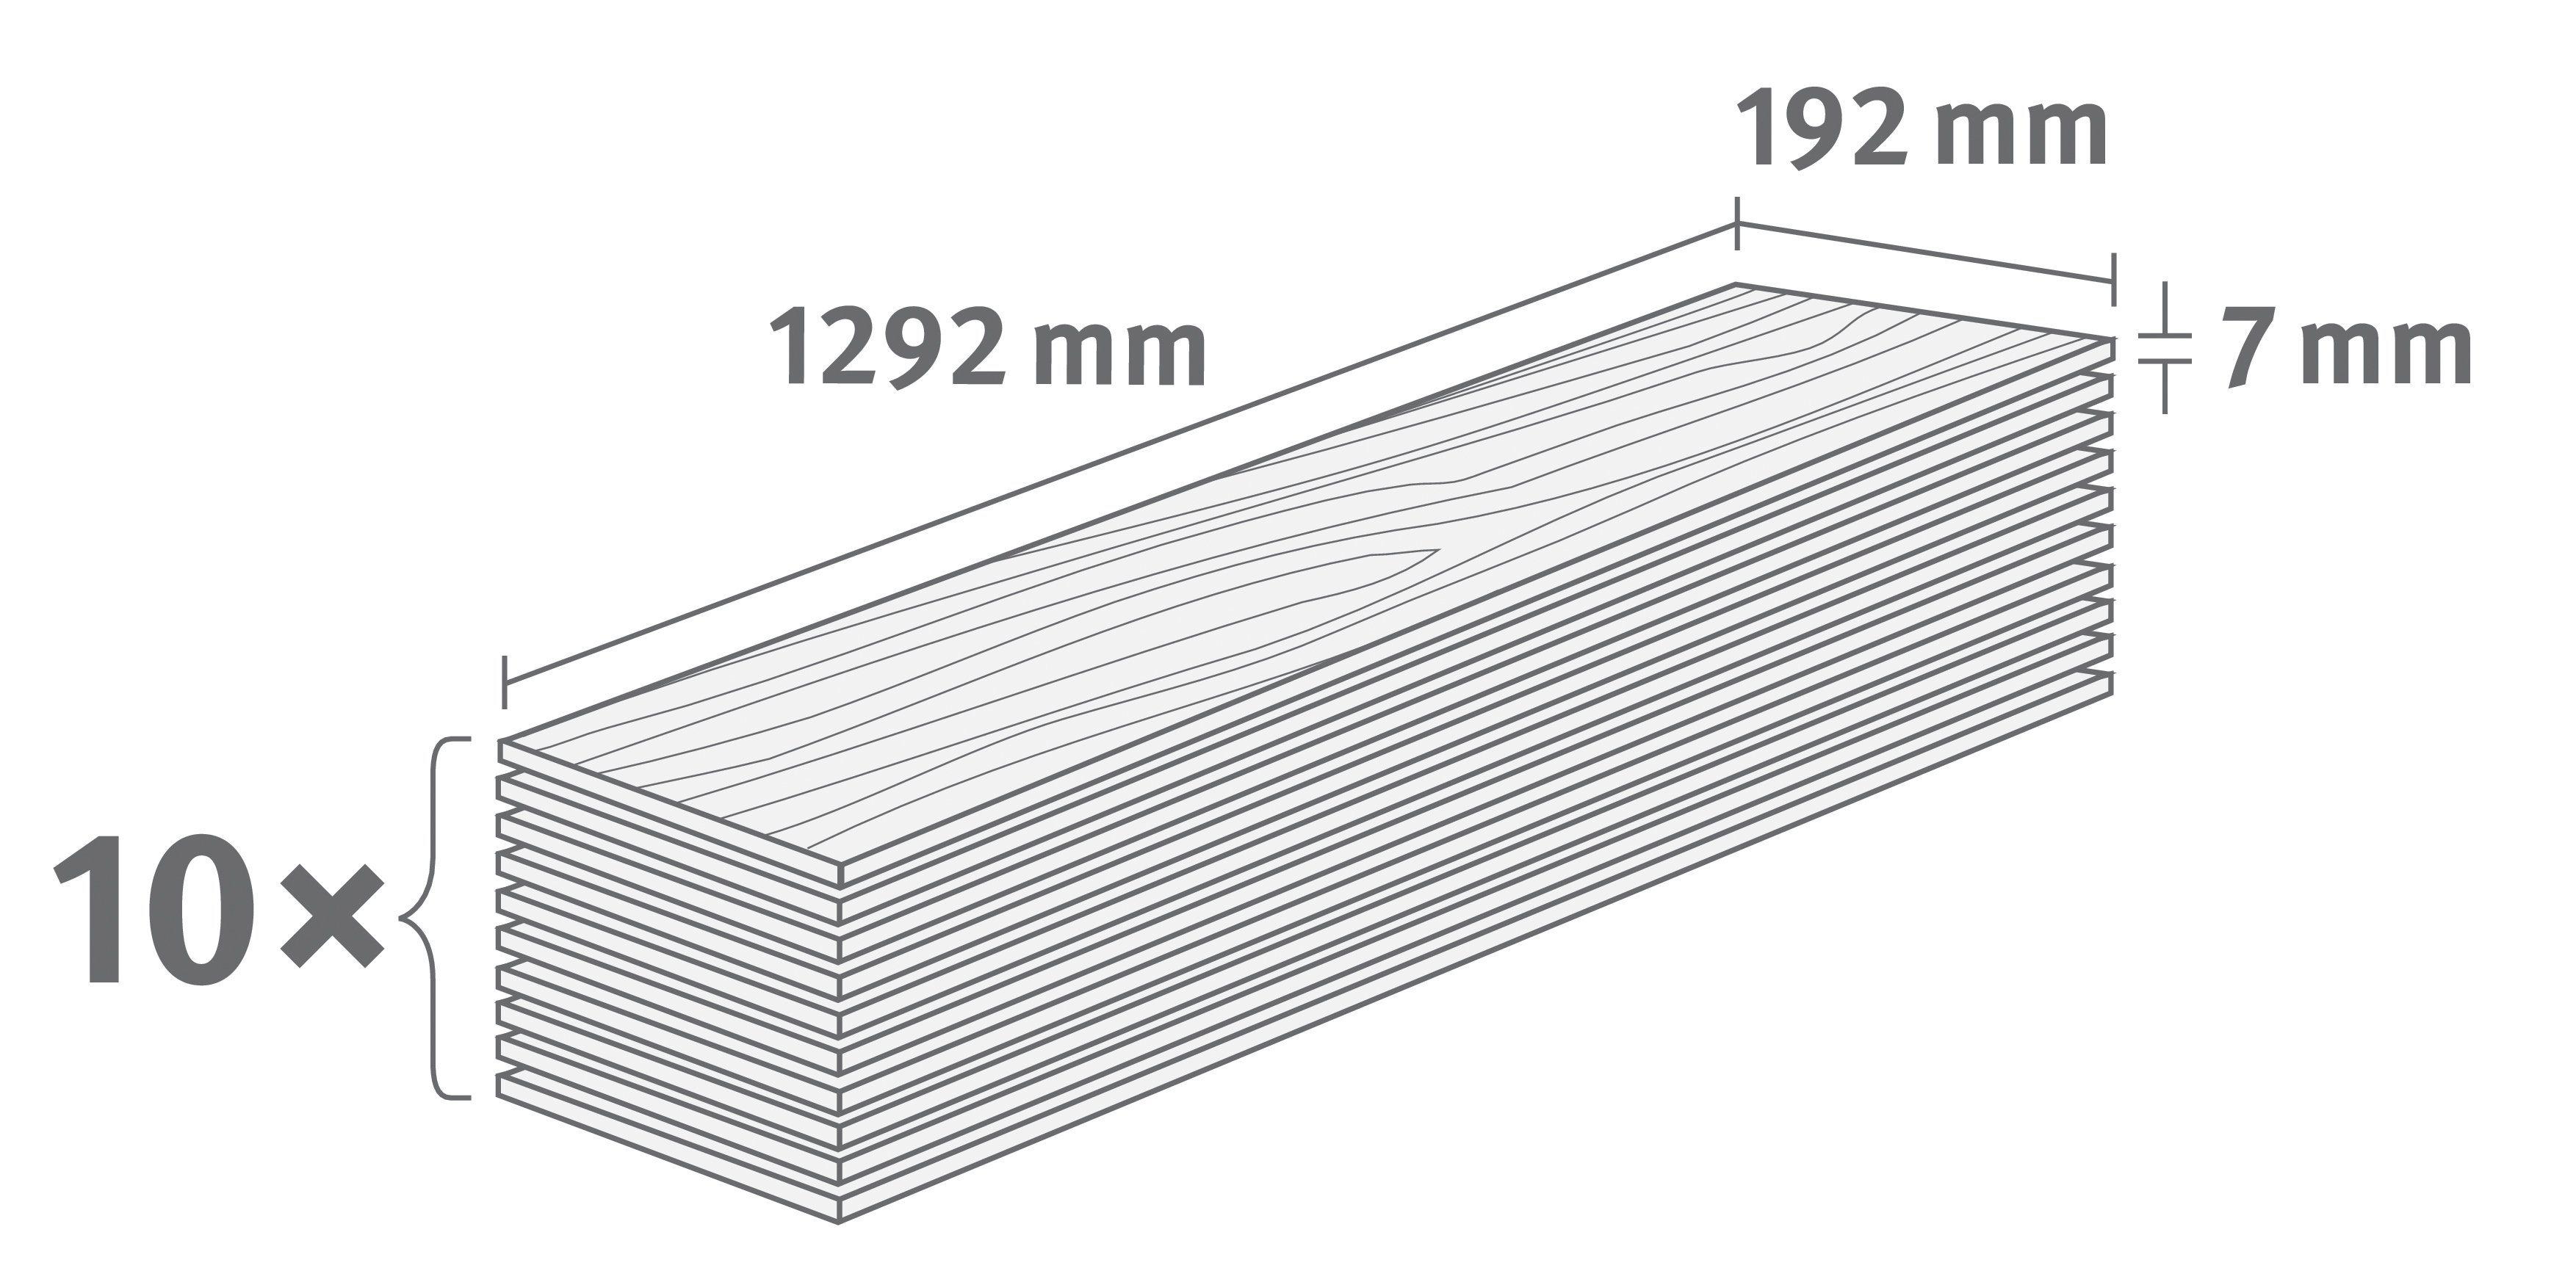 EGGER Laminat »EGGER BASIC Kanadische Fichte«, 1292 x 192 mm, Stärke: 7 mm | Baumarkt > Bodenbeläge > Laminat | EGGER